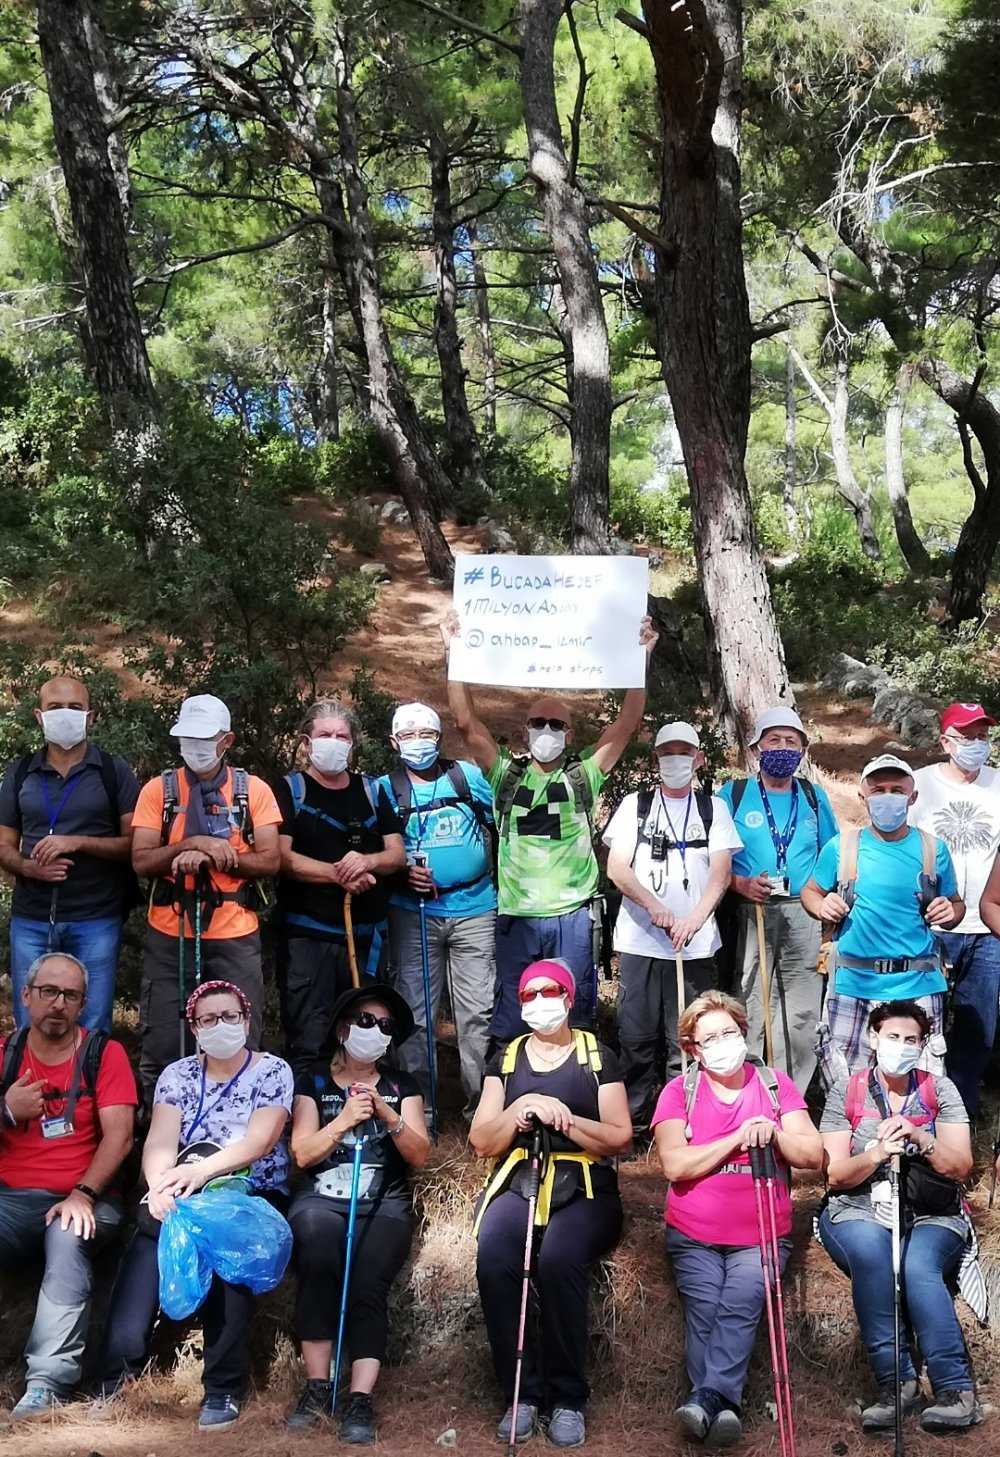 CHP'li Aykut'tan dayanışma yürüyüşü çağrısı